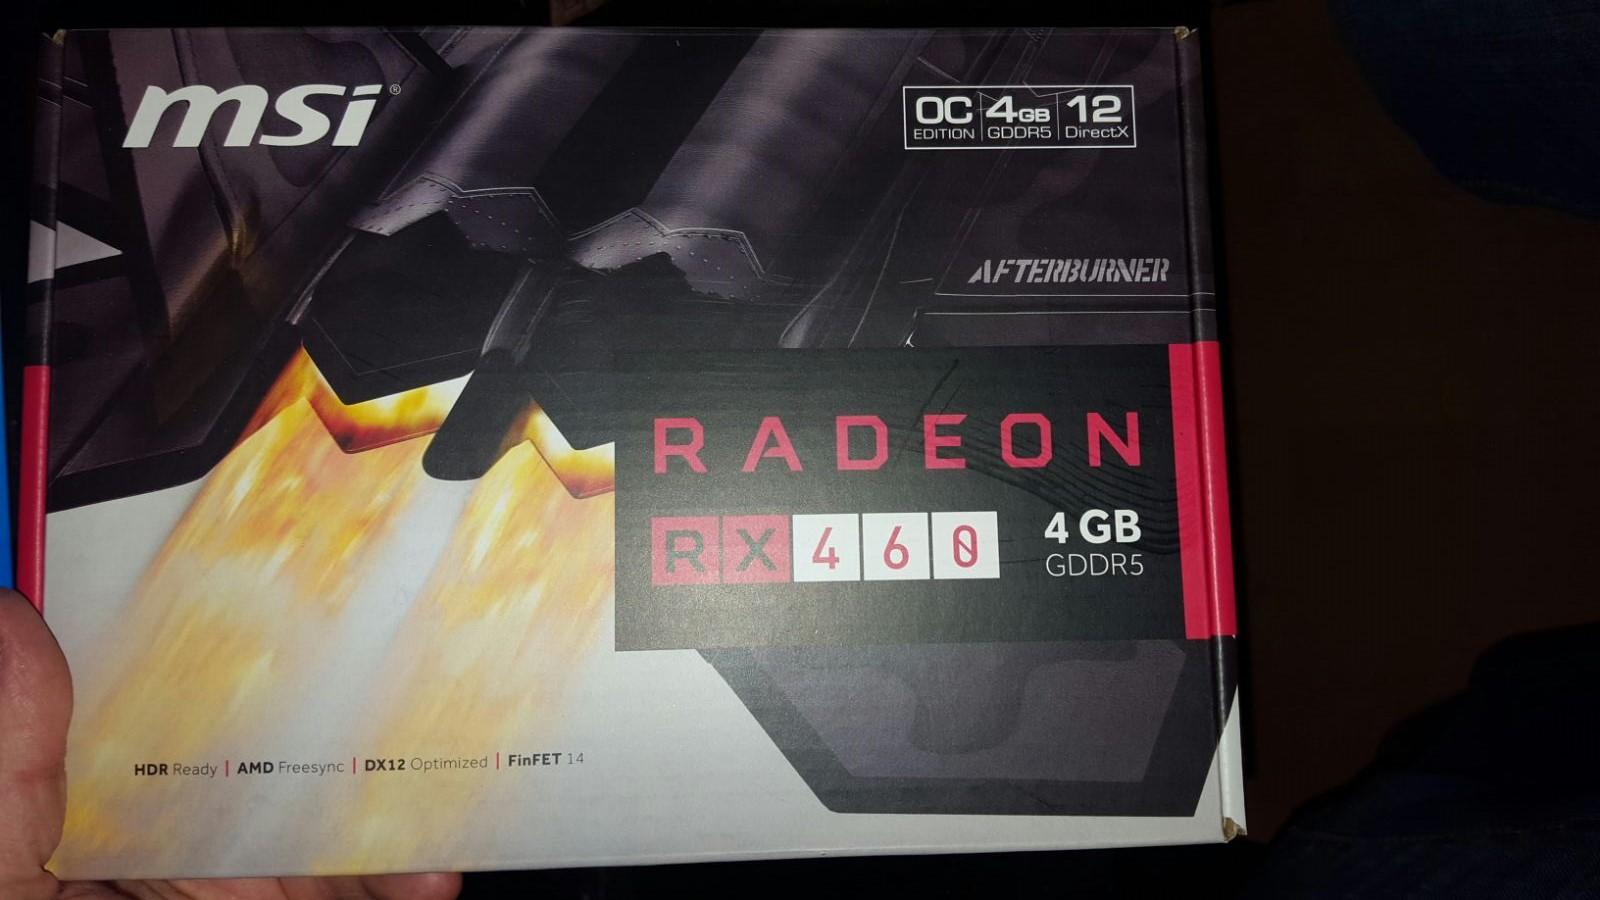 MSI Radeon RX460